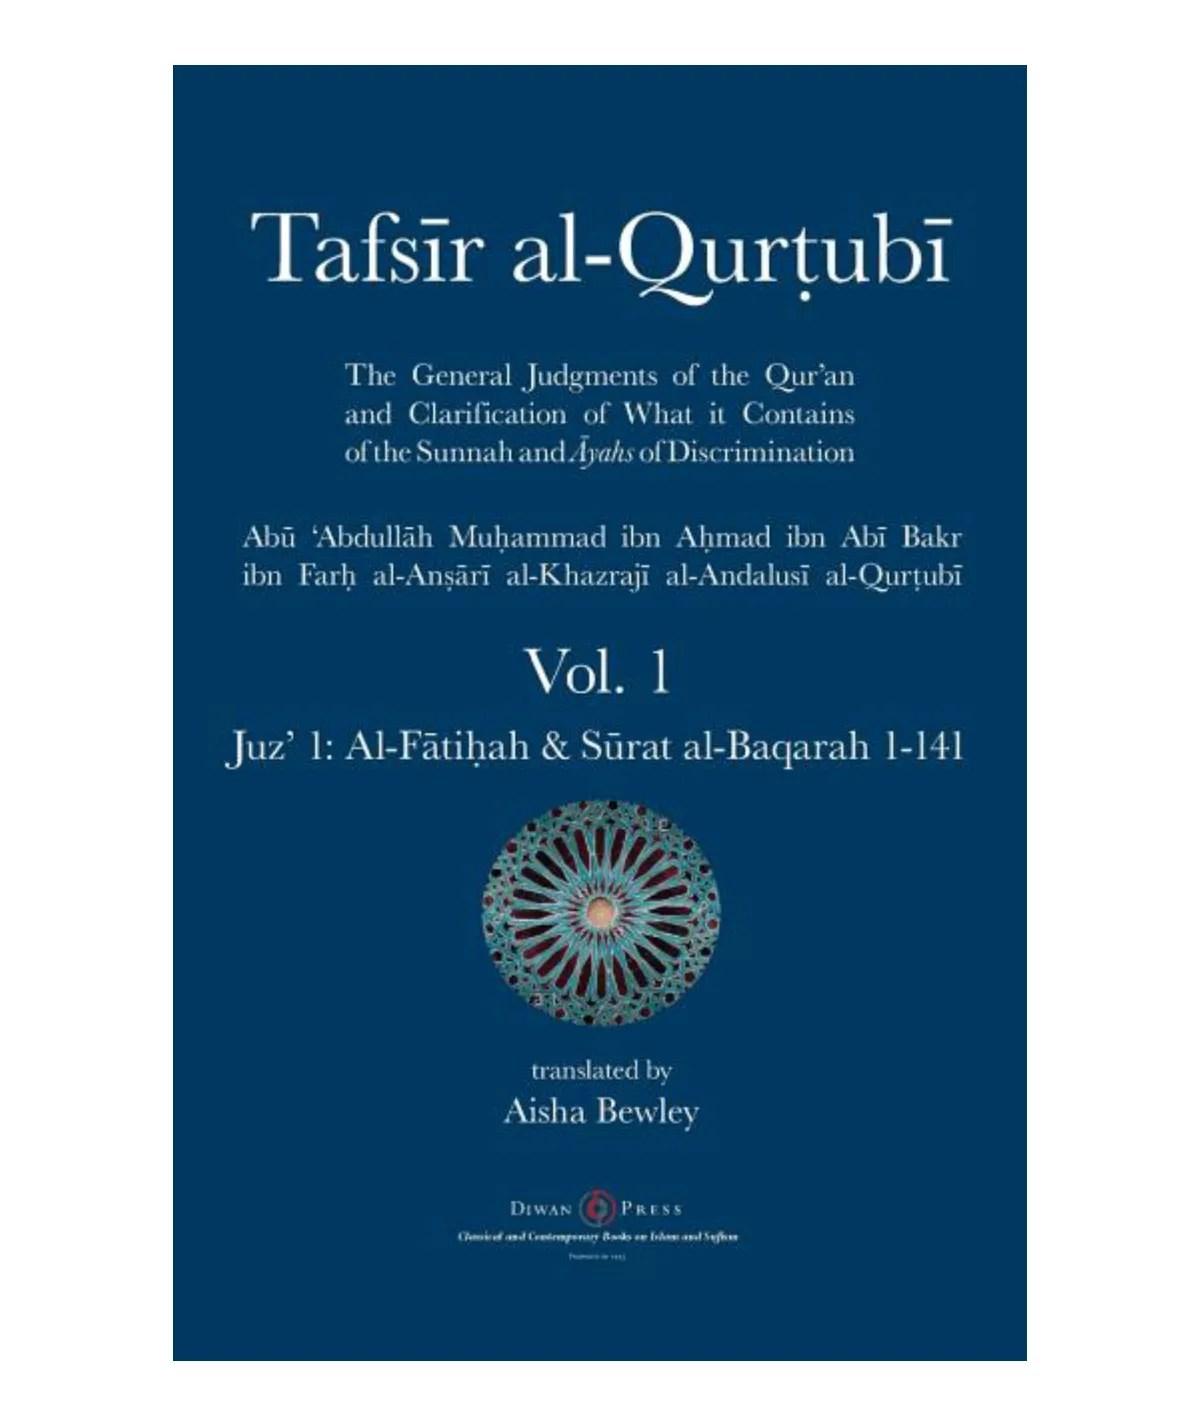 Tafsir al-Qurtubi - Vol. 1: Juz' 1: Al-Fātiḥah & Sūrat al-Baqarah 1-141: Al-Qurtubi, Abu 'abdullah Muhammad | Bewley, Aisha Abdurrahman | Bewley, Abdalhaqq